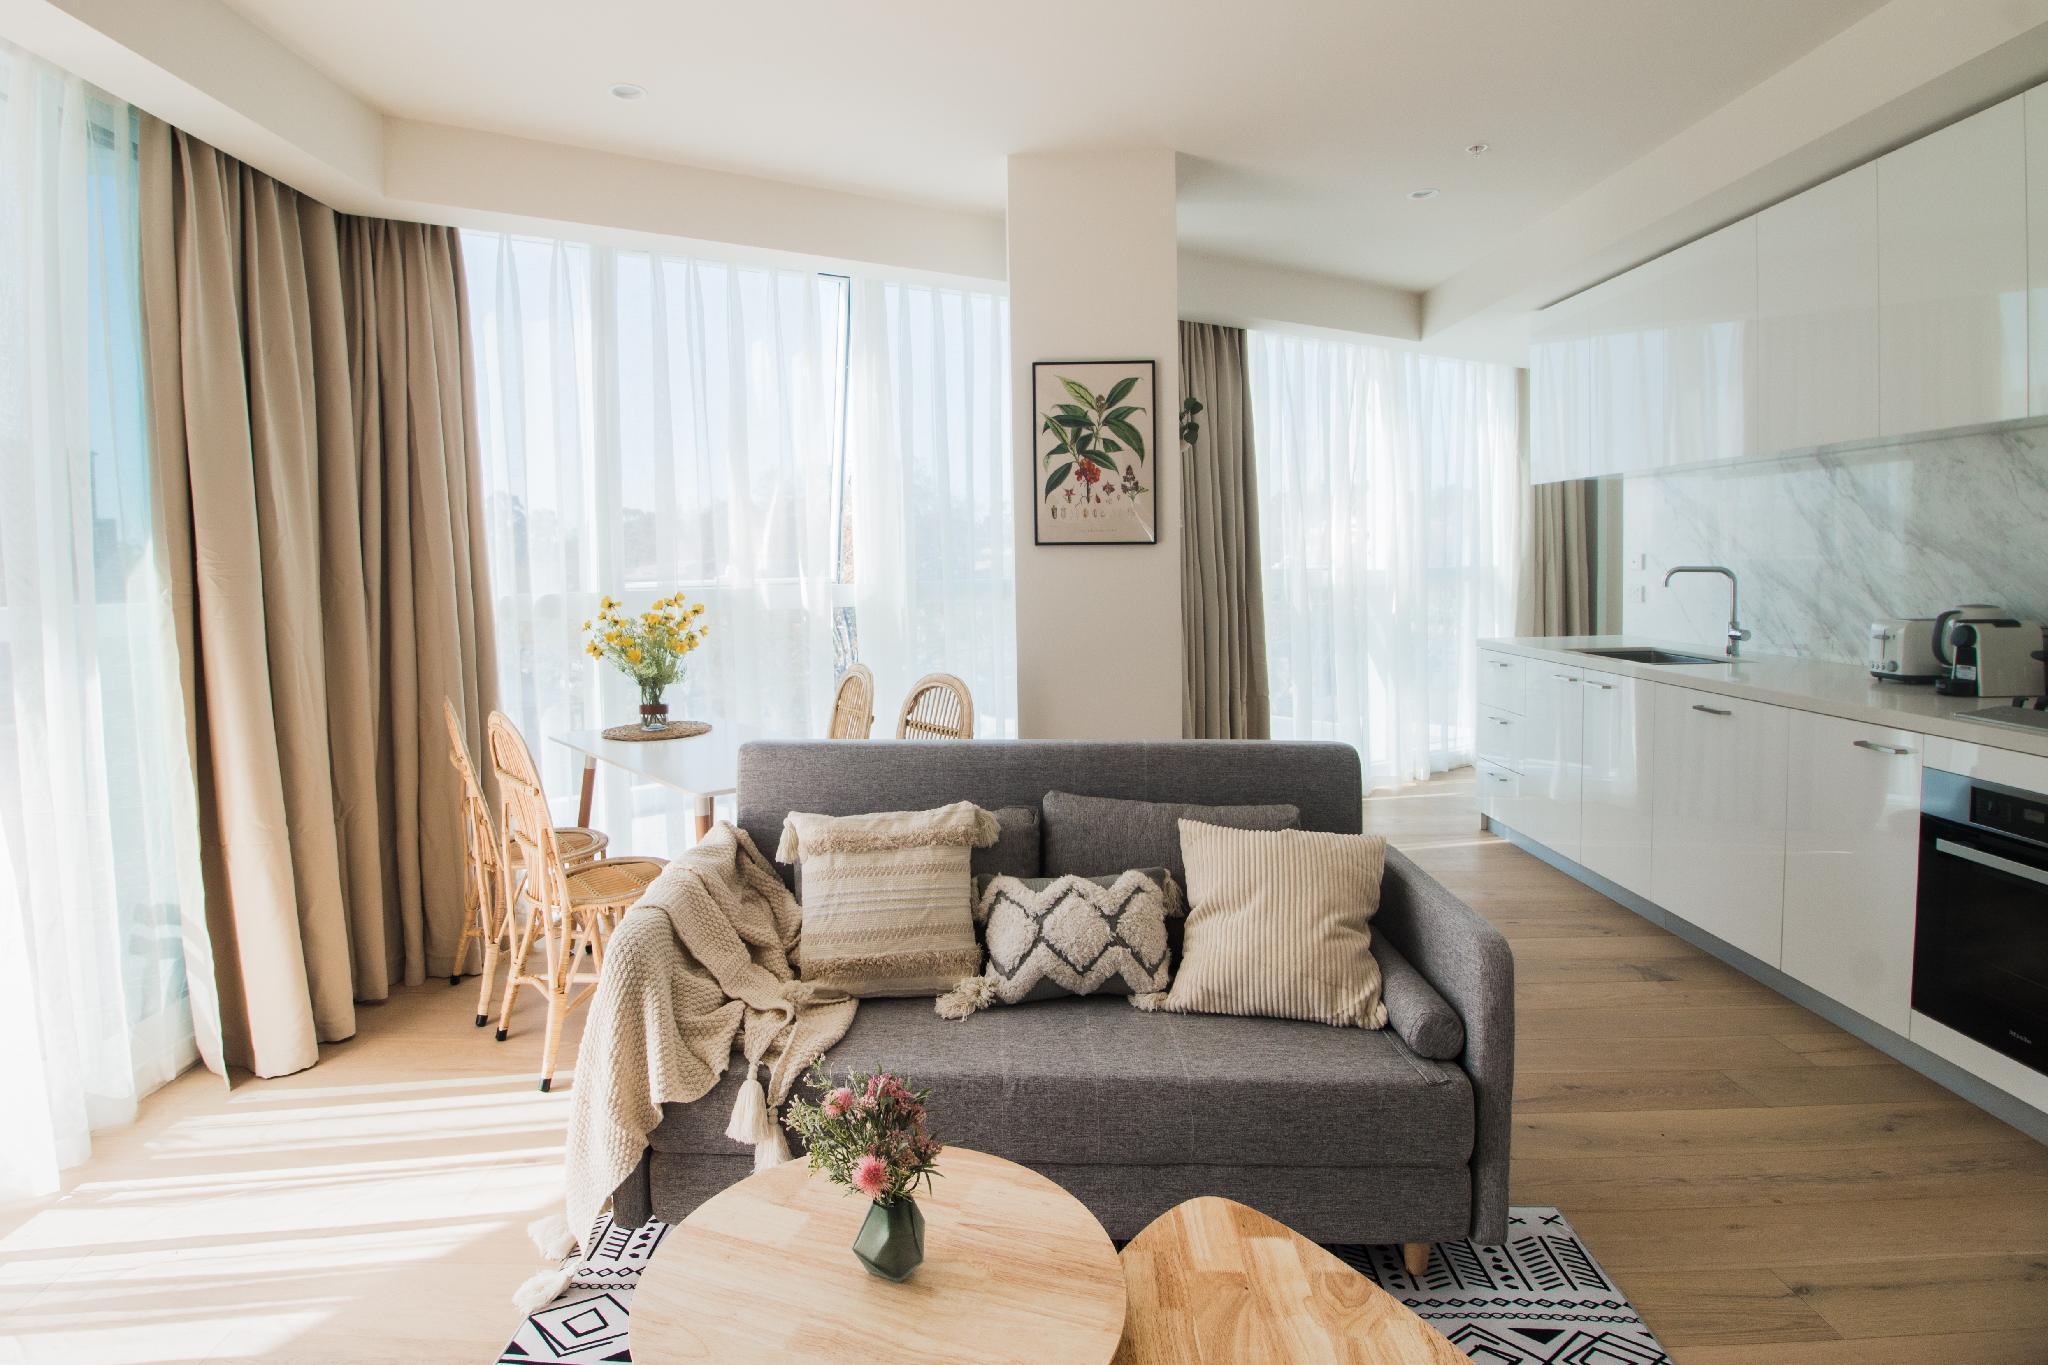 4 North Melbourne Comfortable 2bedroom Apartment